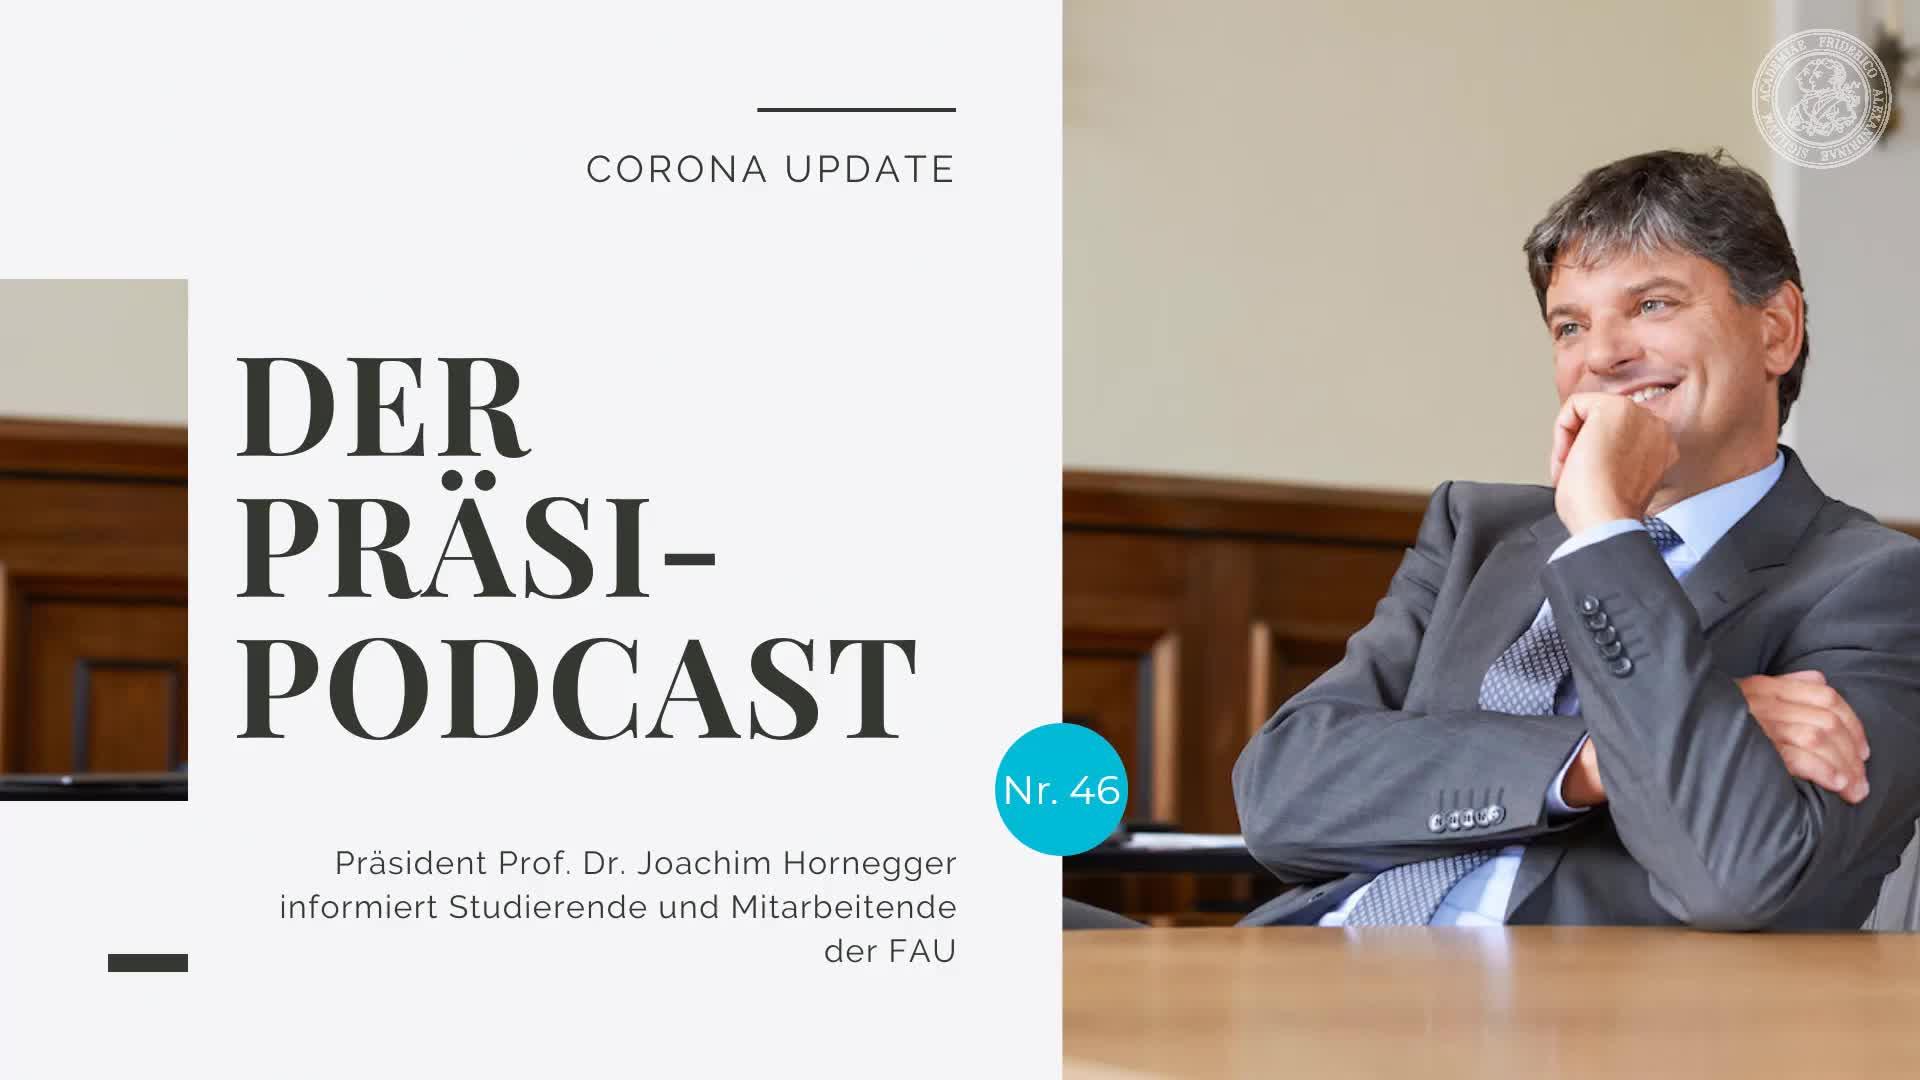 """Der Präsi-Podcast"" vom 12. Mai 2021 preview image"